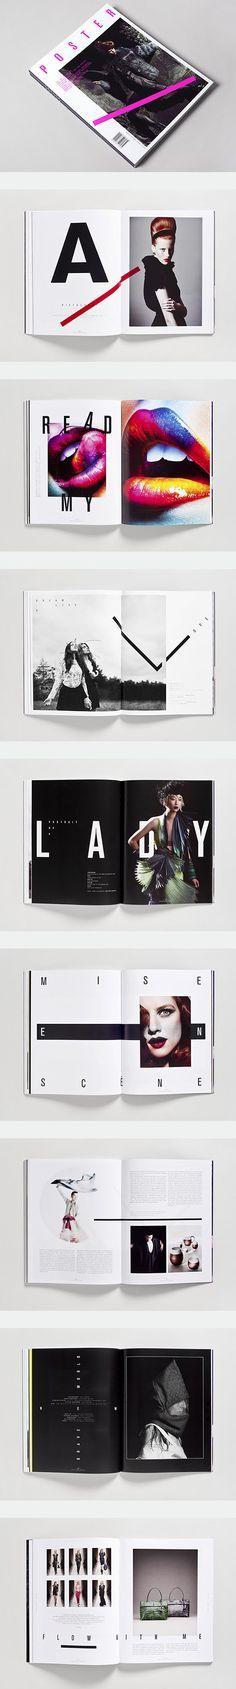 Graphic Design Layout. Poster Magazine by Toko Design. www.LIVETHEGLAMOU...